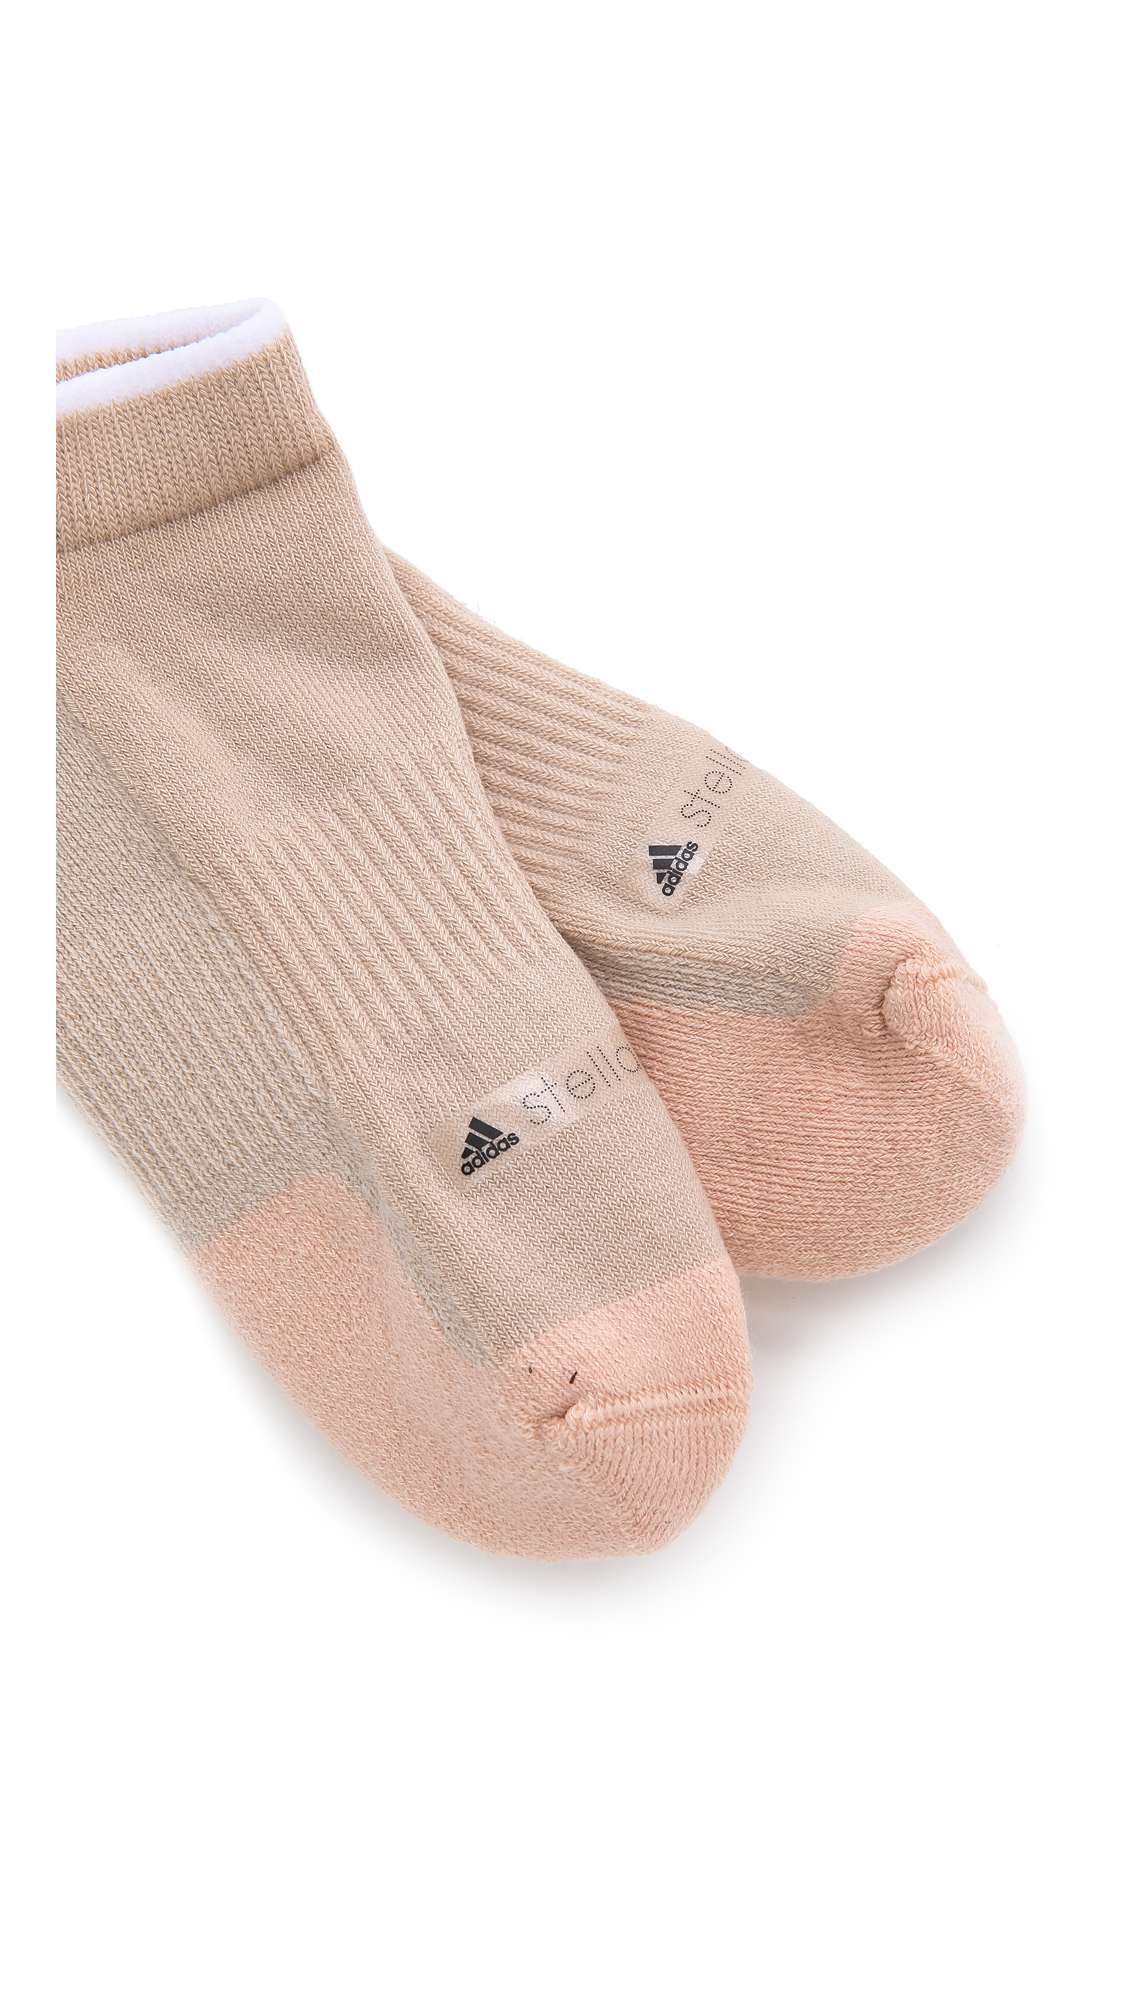 Lyst adidas da stella mccartney barricata calzini gingerfrost in rosa